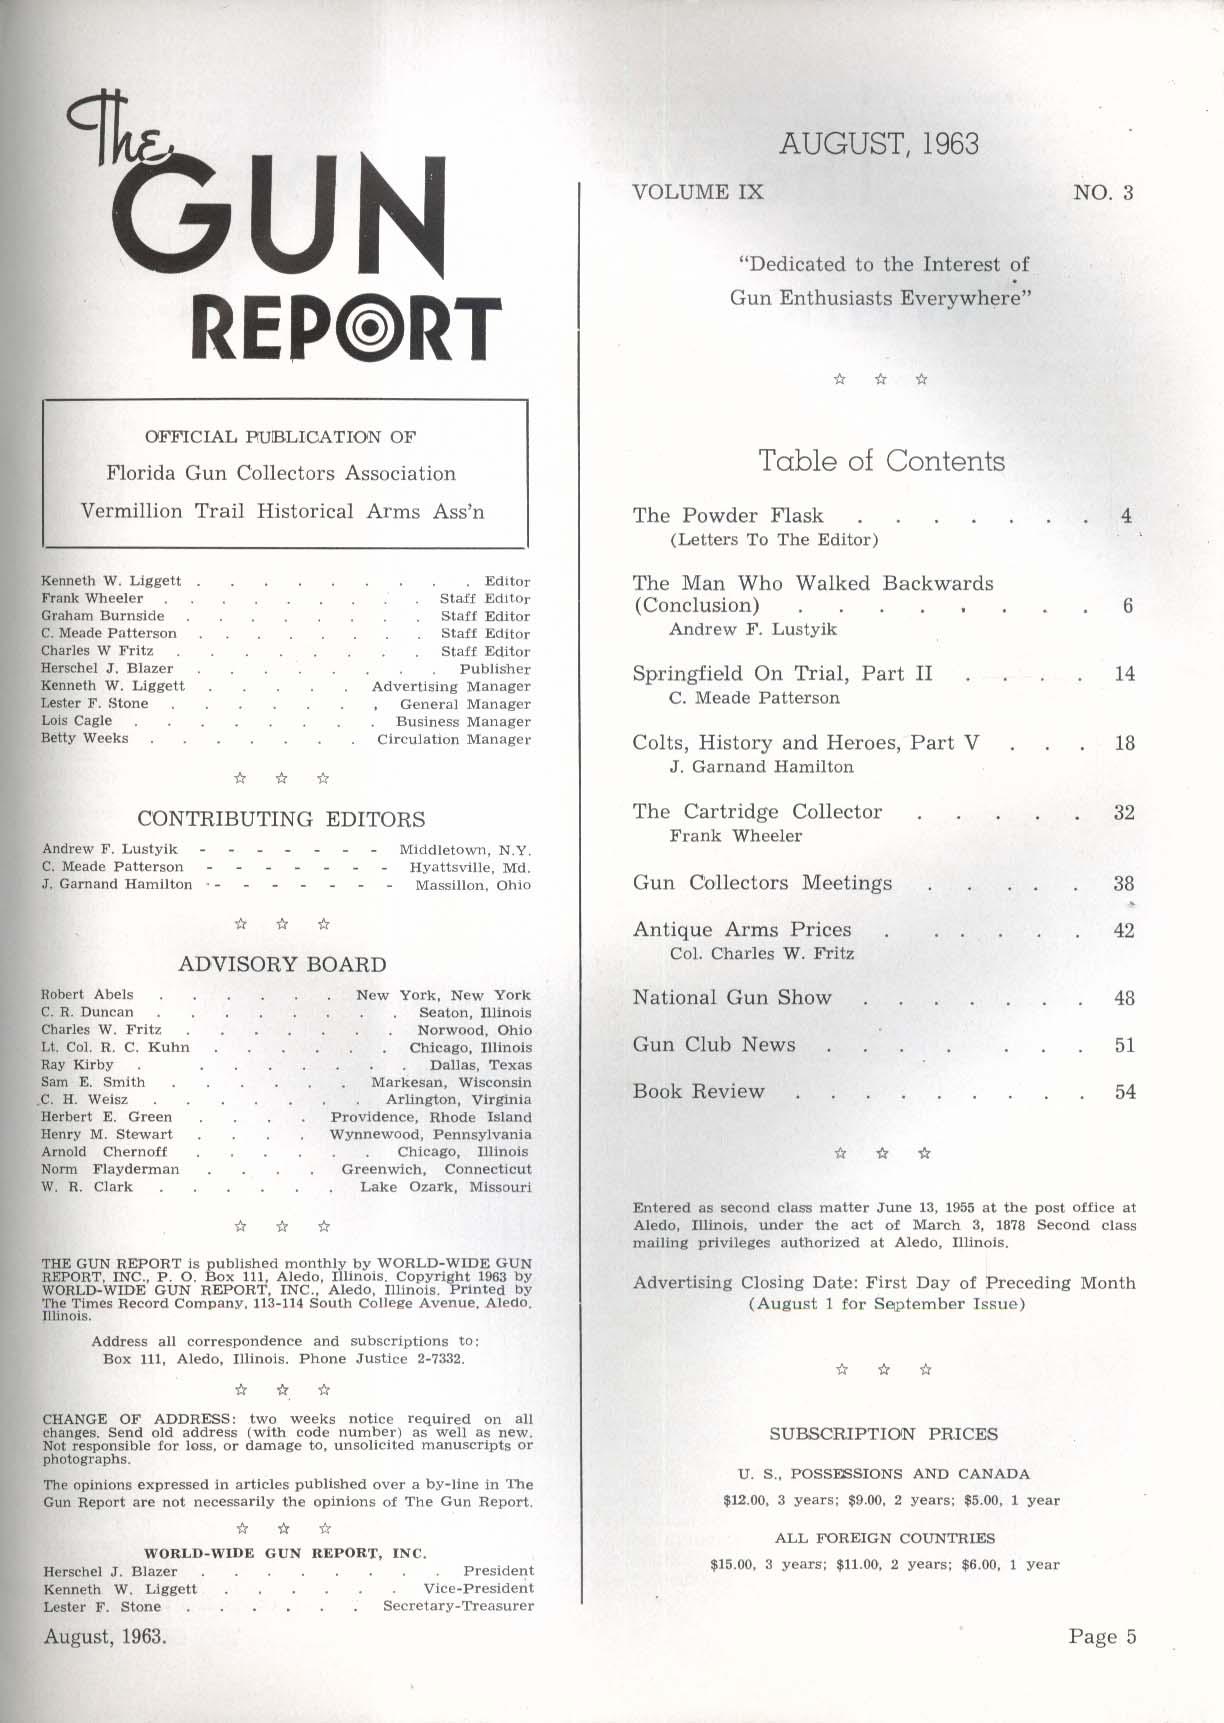 GUN REPORT Stonewall Jackson Andrew Lustyik Austrian Rifle Springfield 8 1963